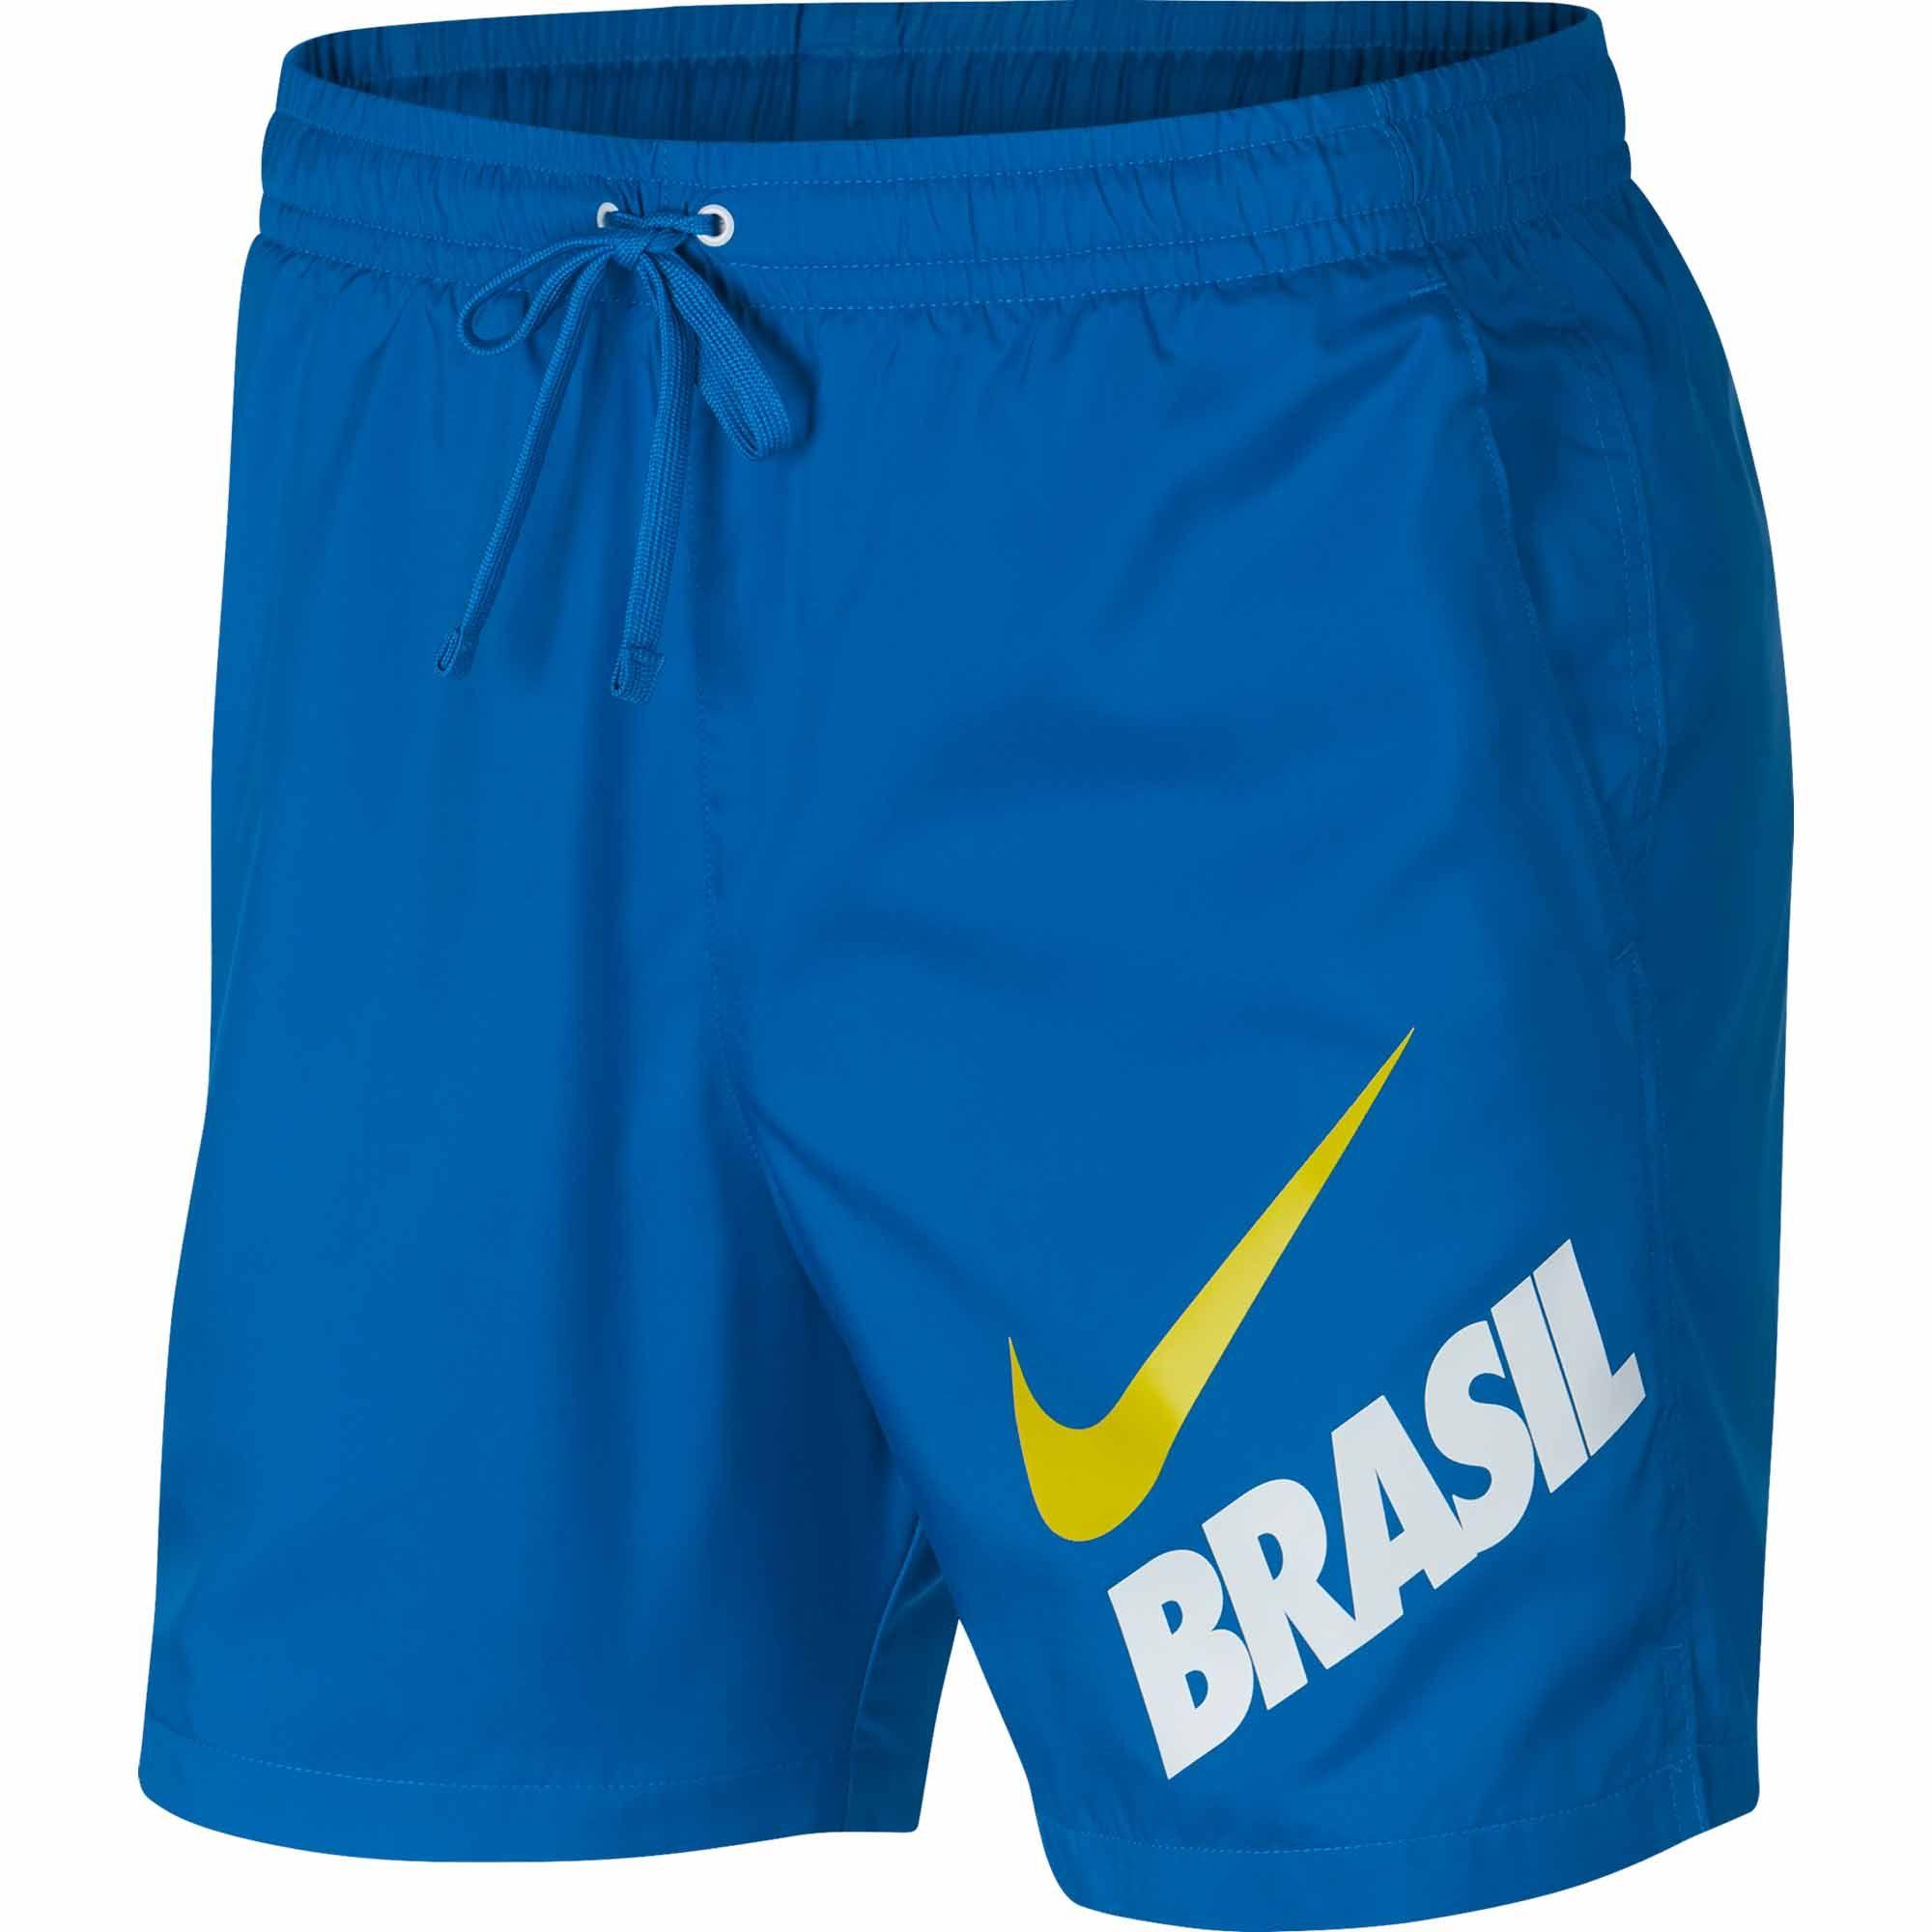 moderadamente Desobediencia Emperador  Nike Brazil Woven Flow Shorts - Soar/White - SoccerPro | Soccer shorts, Nike  men, Low crotch pants